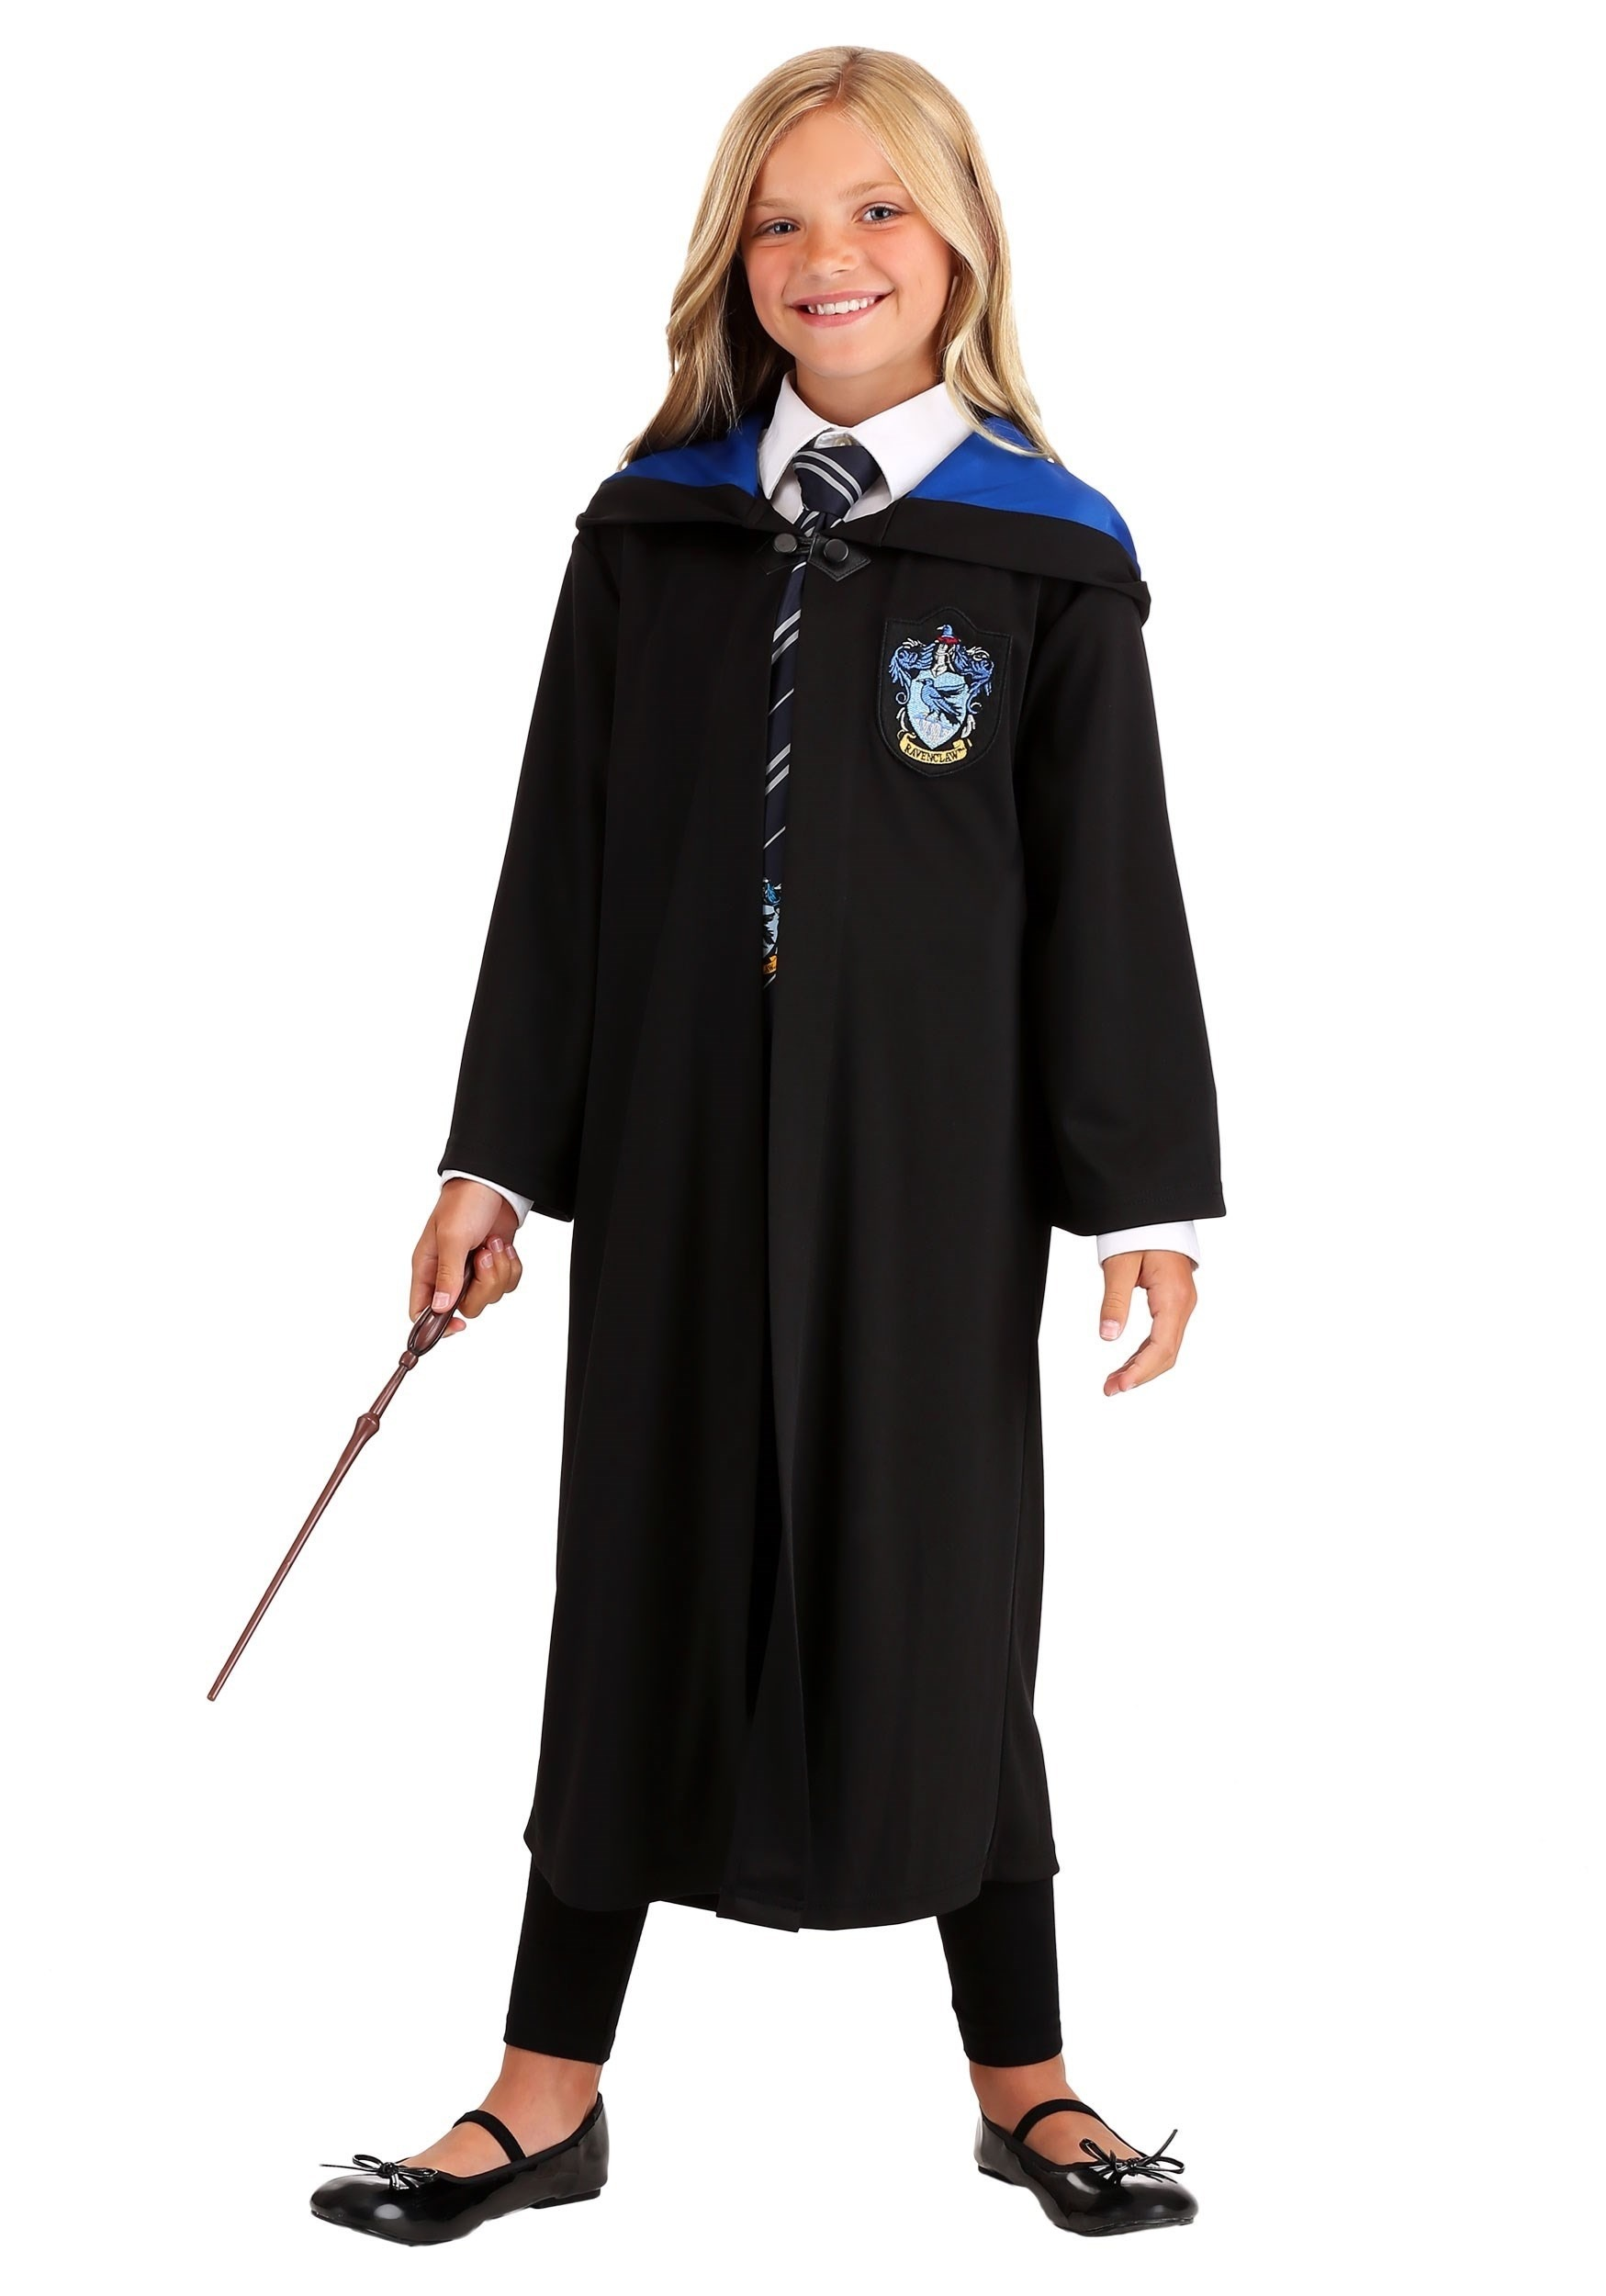 Harry Potter Ravenclaw Robe for Kids